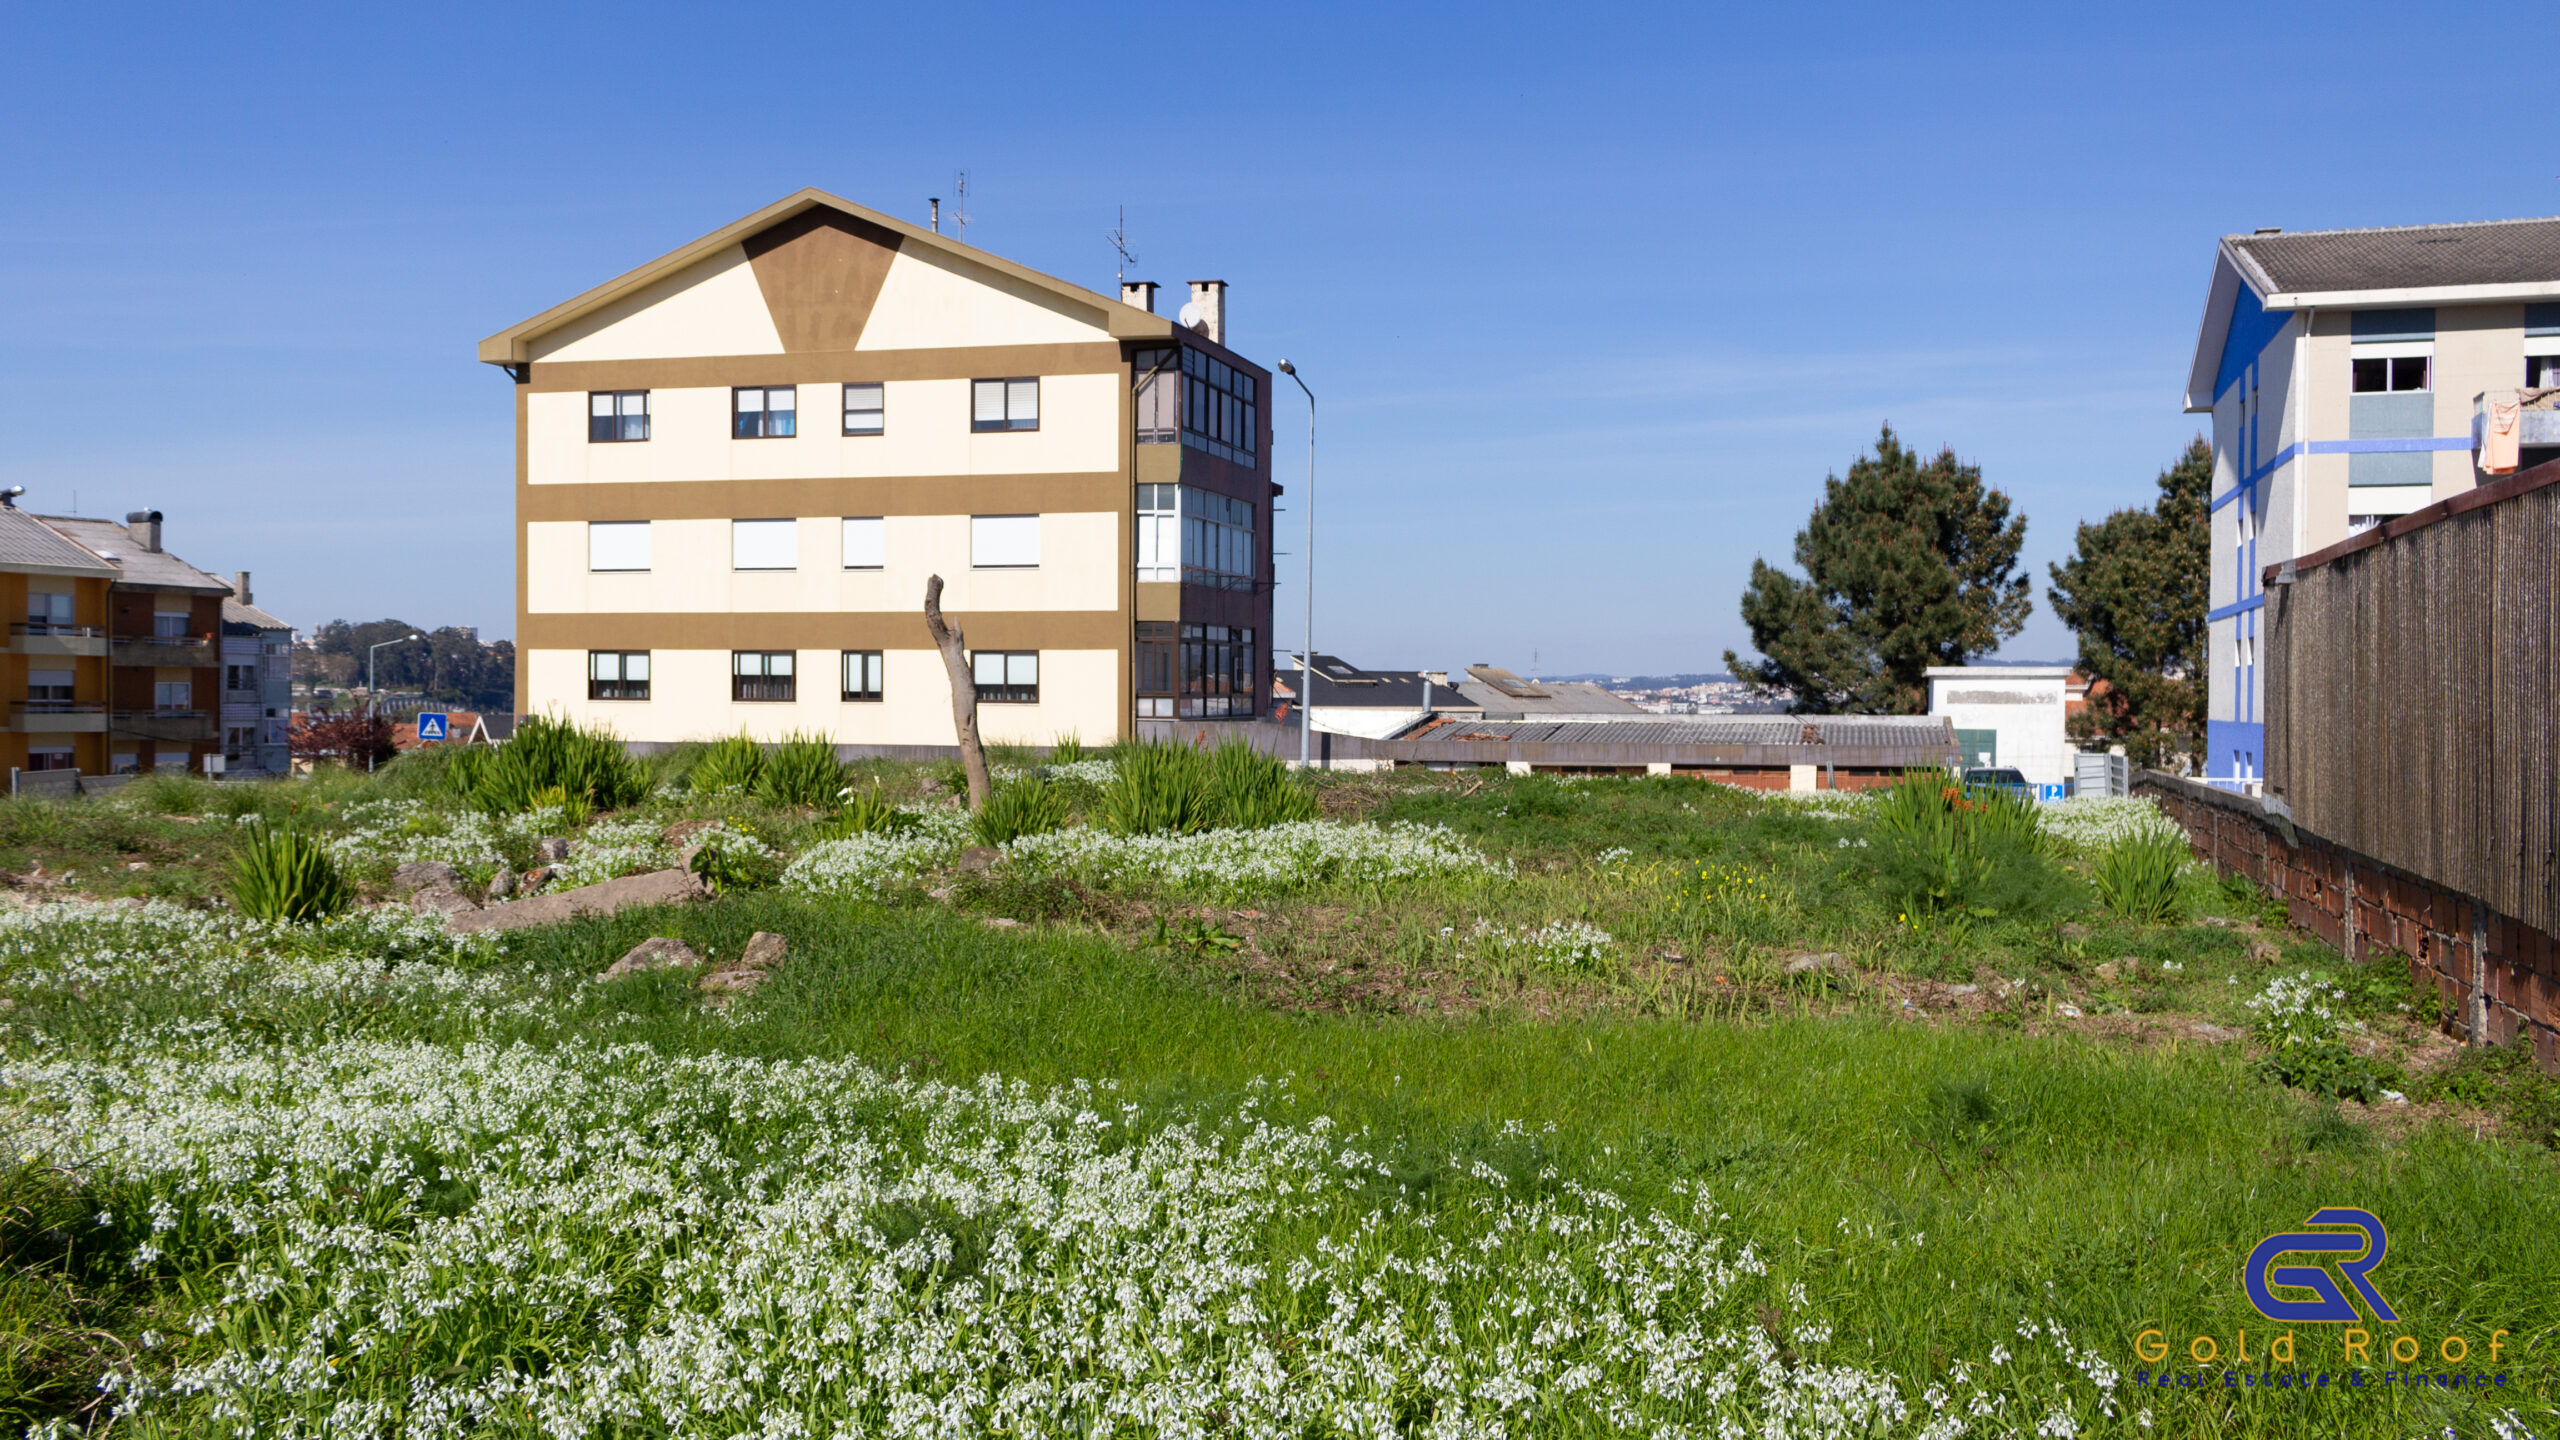 Building land 1312sqm for high-rise housing construction, Oliveira do Douro